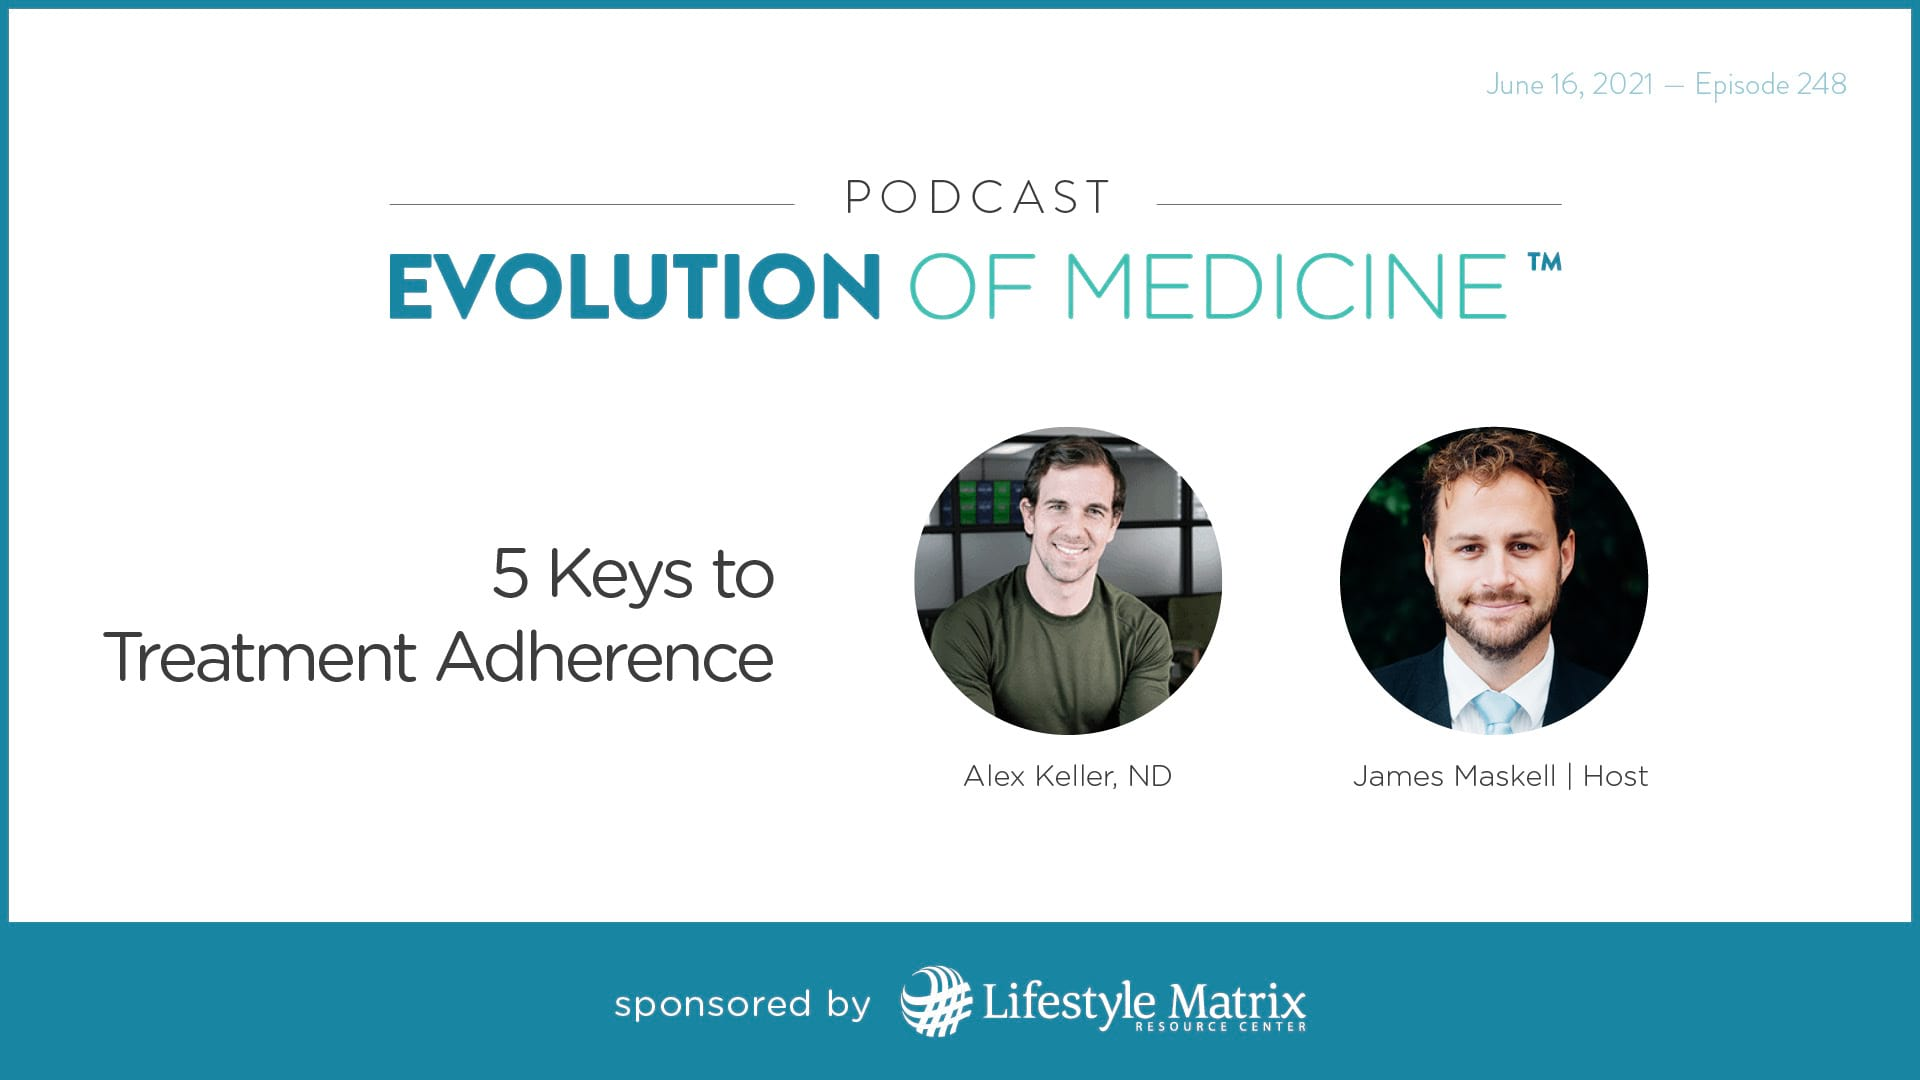 5 Keys to Treatment Adherence